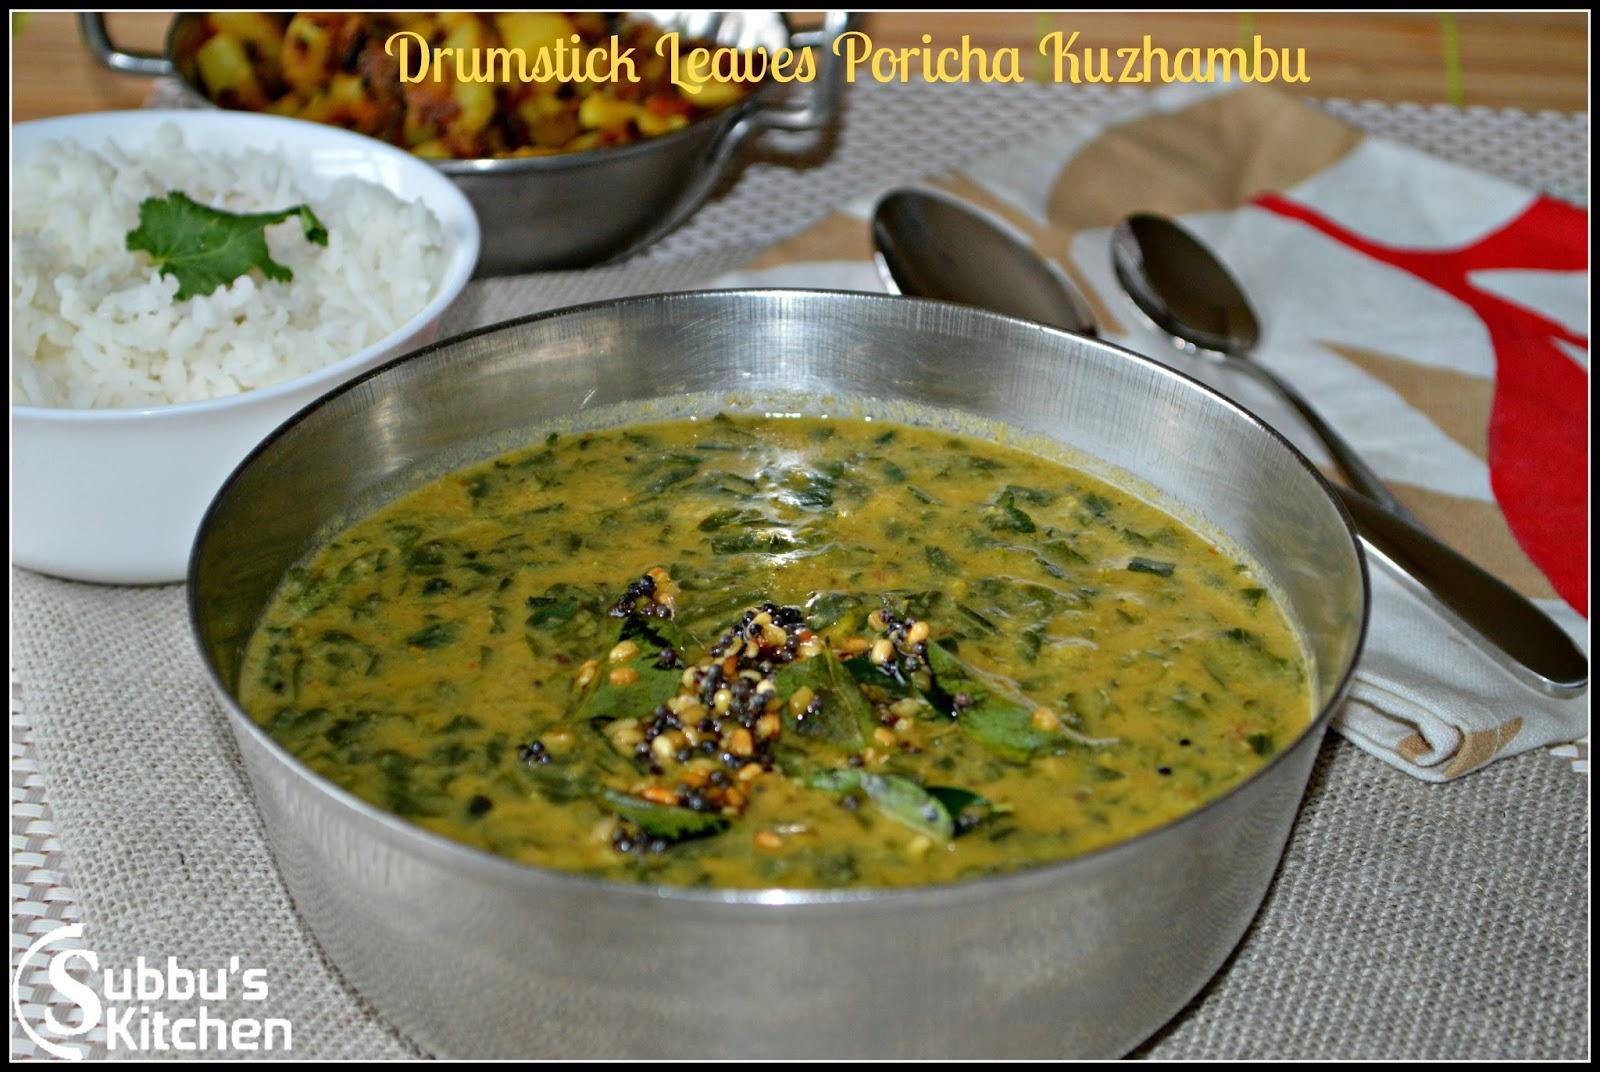 Drumstick Leaves(Murungai keerai) Poricha Kuzhambu